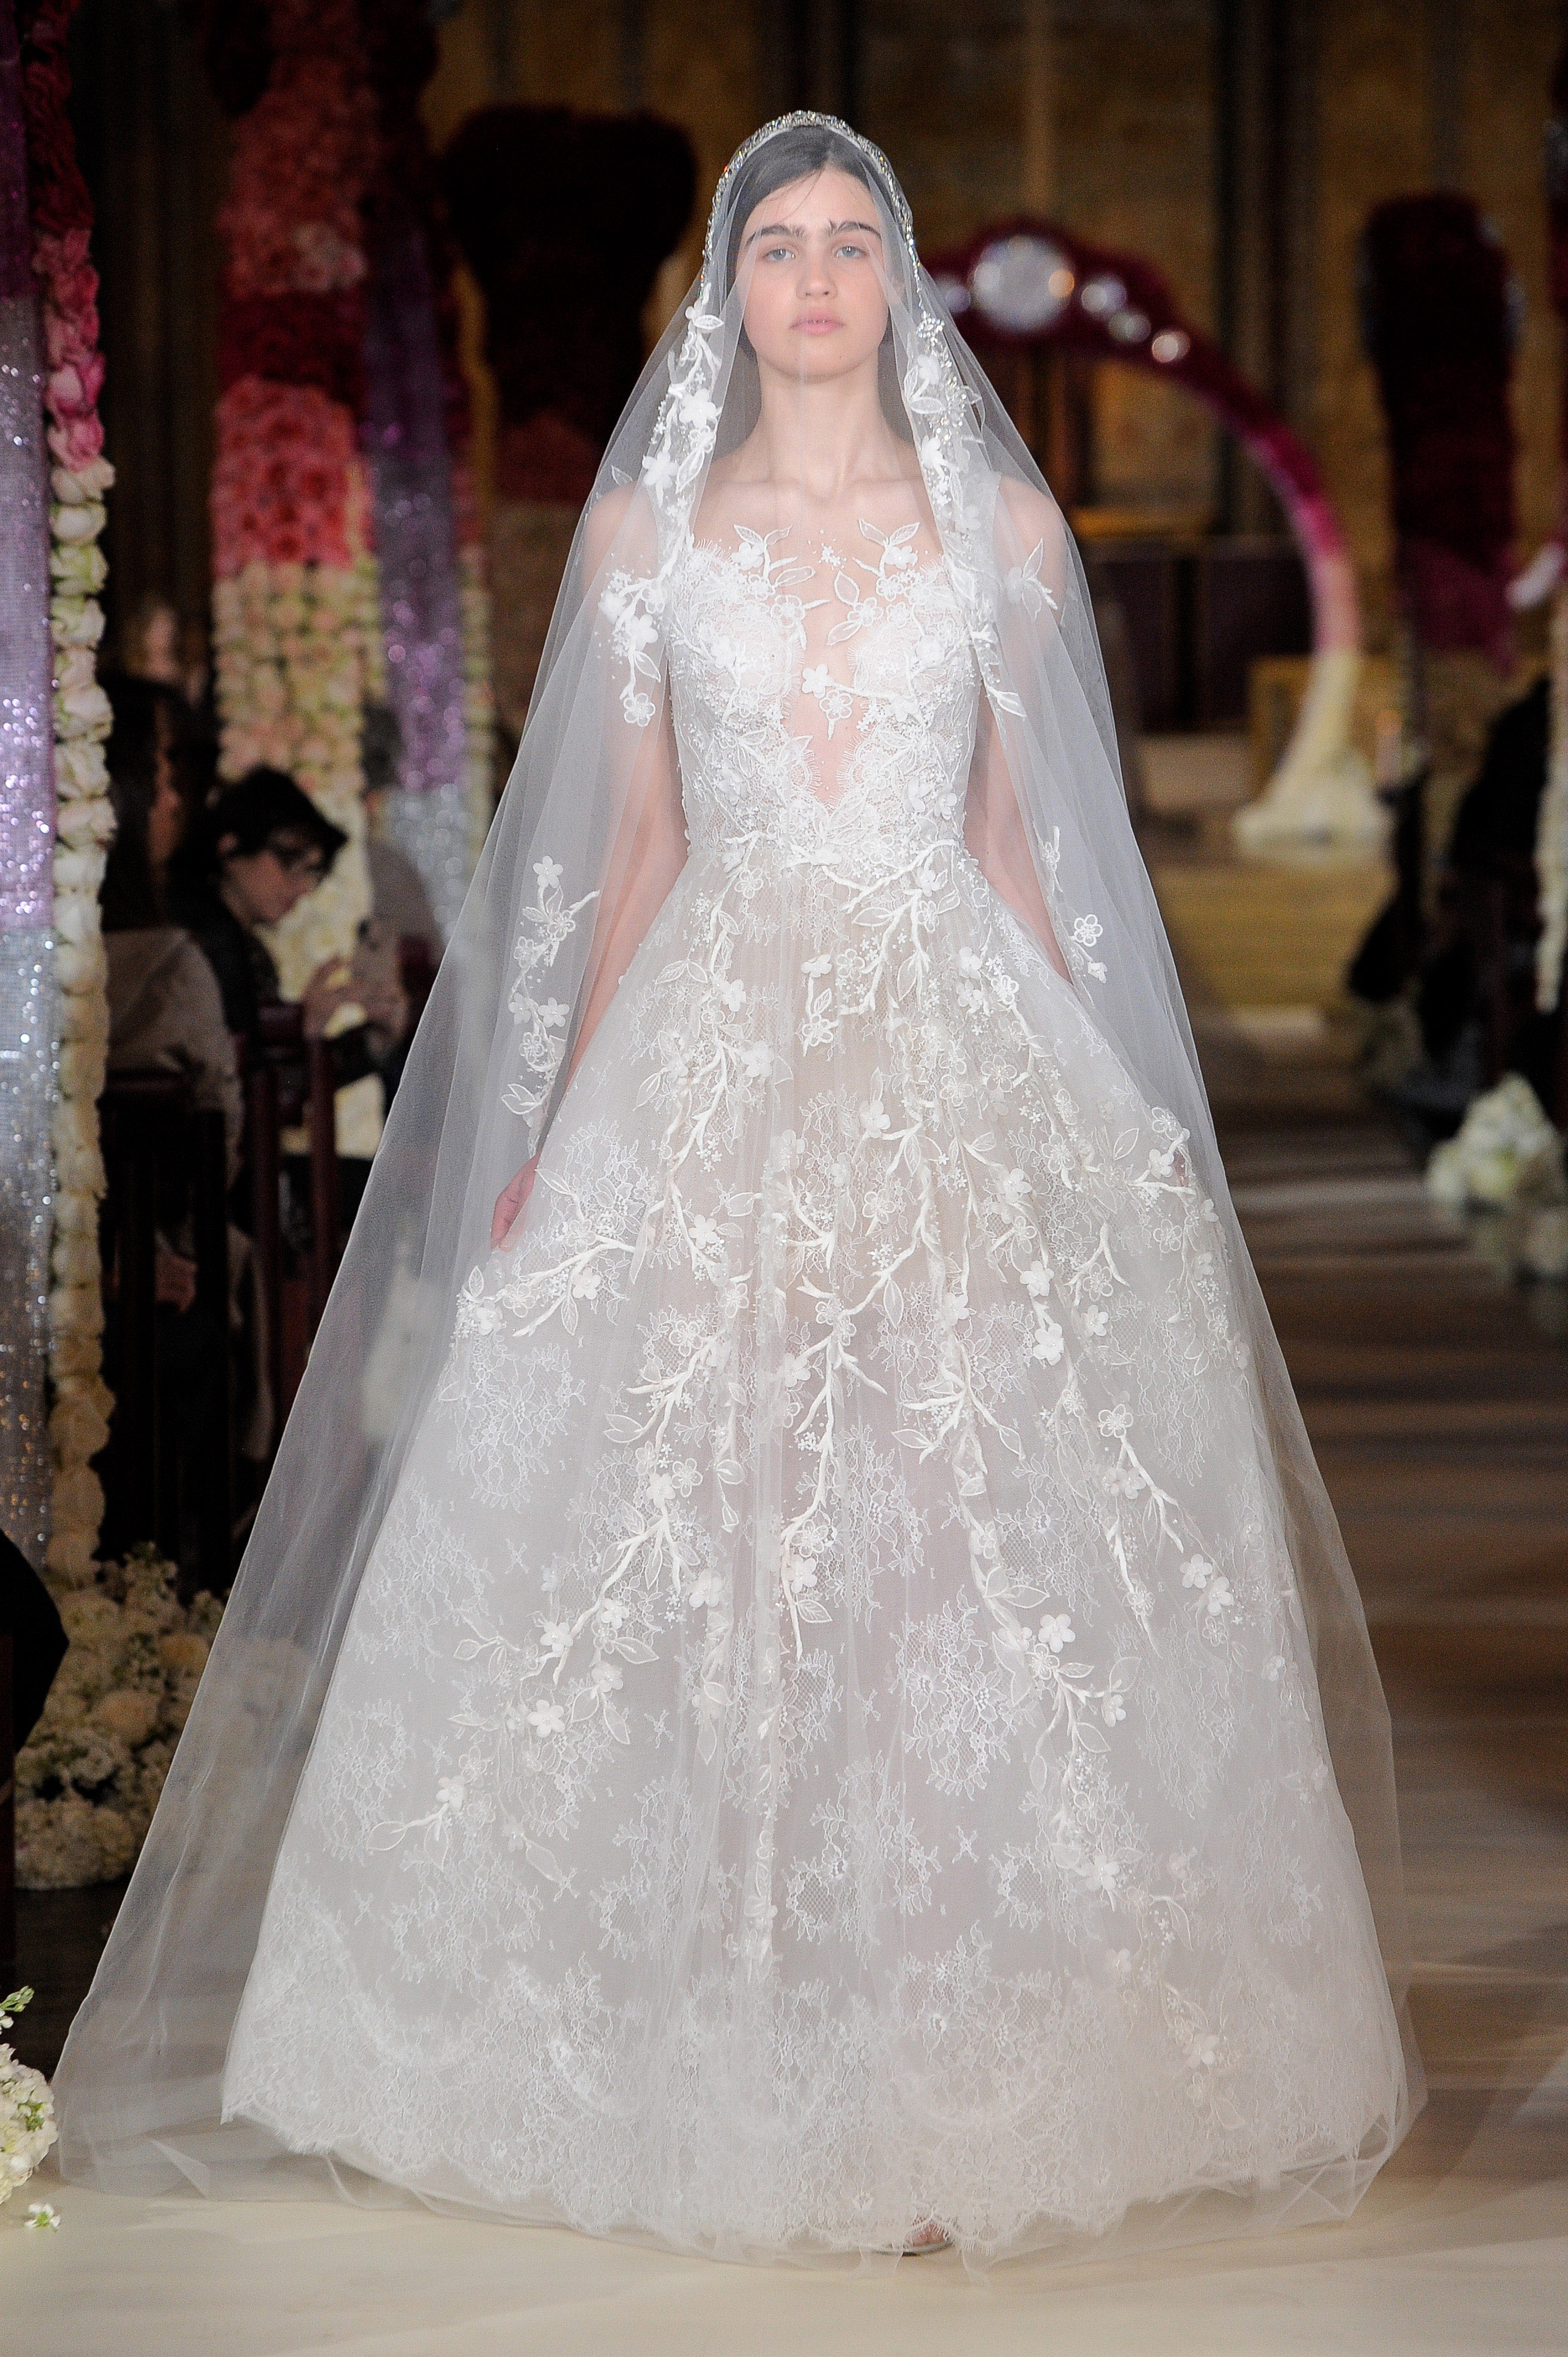 illusion neckline lace vail ball gown wedding dress Reem Acra Spring 2020